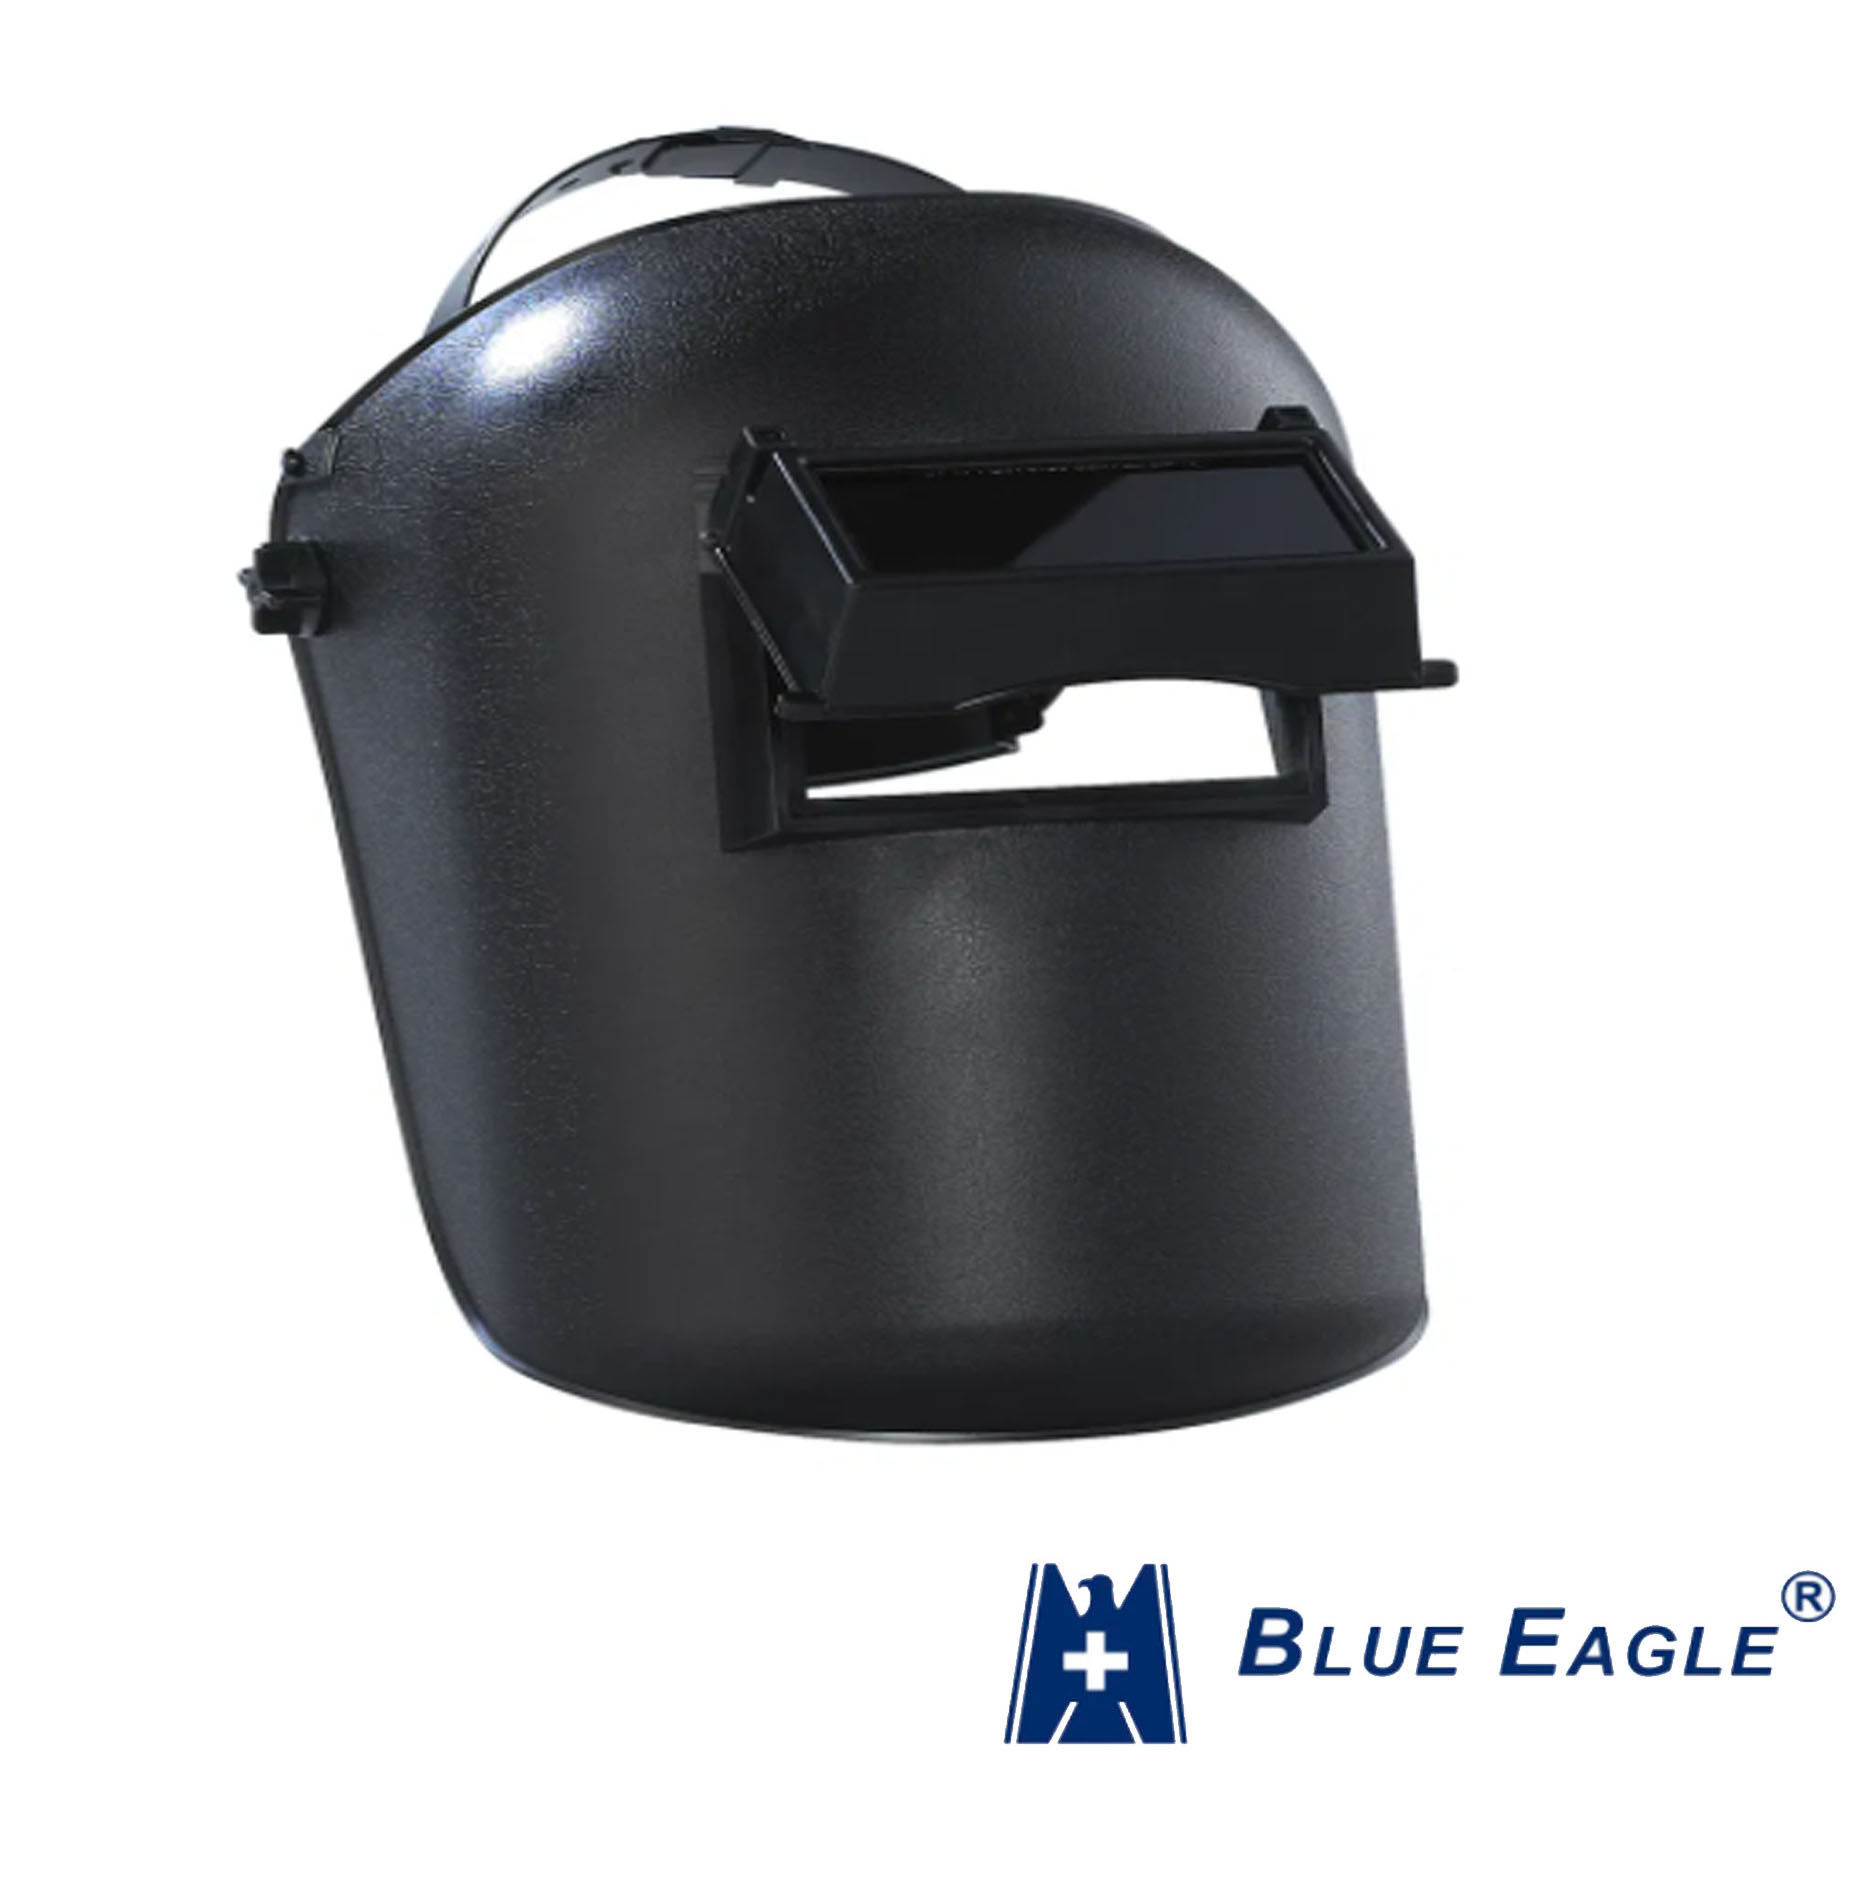 Mascara de soldar Blue Ealge 633P